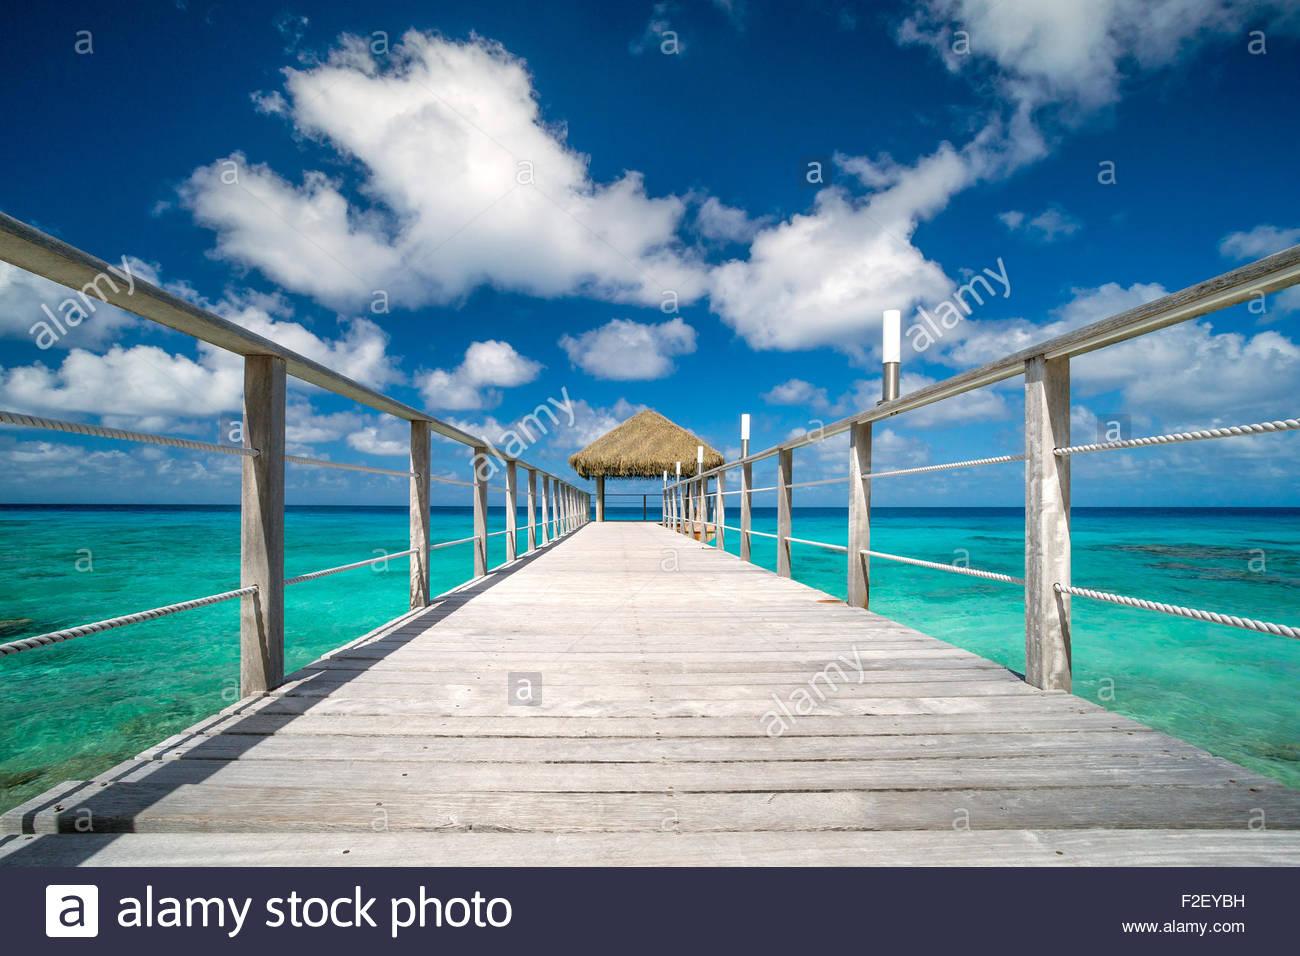 Rangiroa : Maitai hotel - jetty (pier) over the lagoon (French Polynesia) - Stock Image